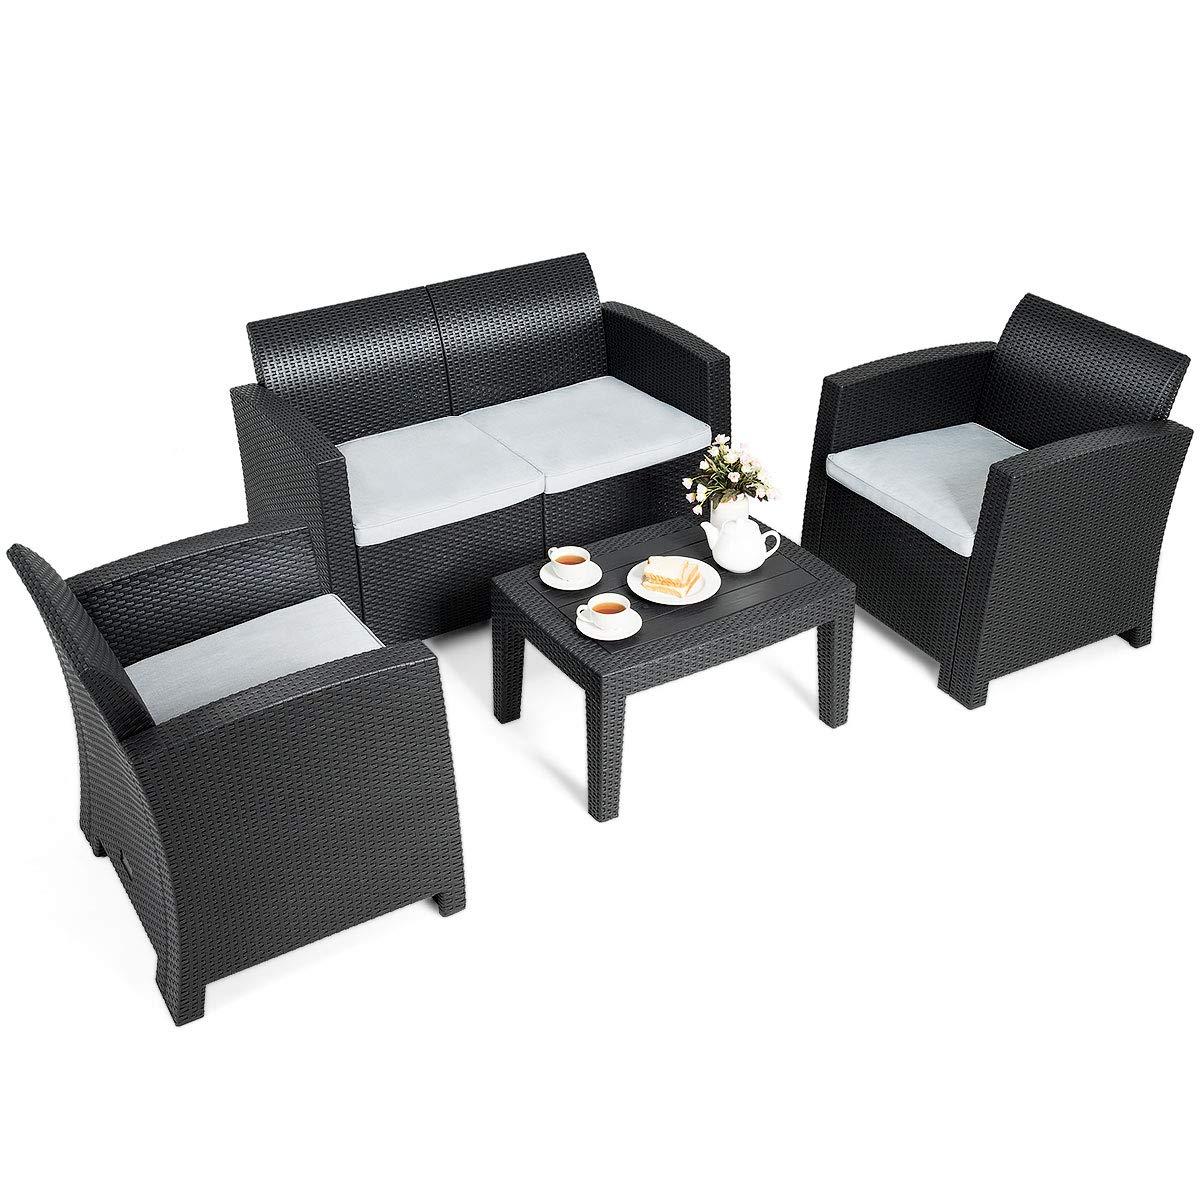 Tangkula 4 Piece Patio Furniture Set, Rattan Table Chair Set, Modern Wicker Rattan PE Conversation Sectional Sofa Set w Removable Cushion, Outdoor Indoor Use Sectional Yard Furniture Set, Black